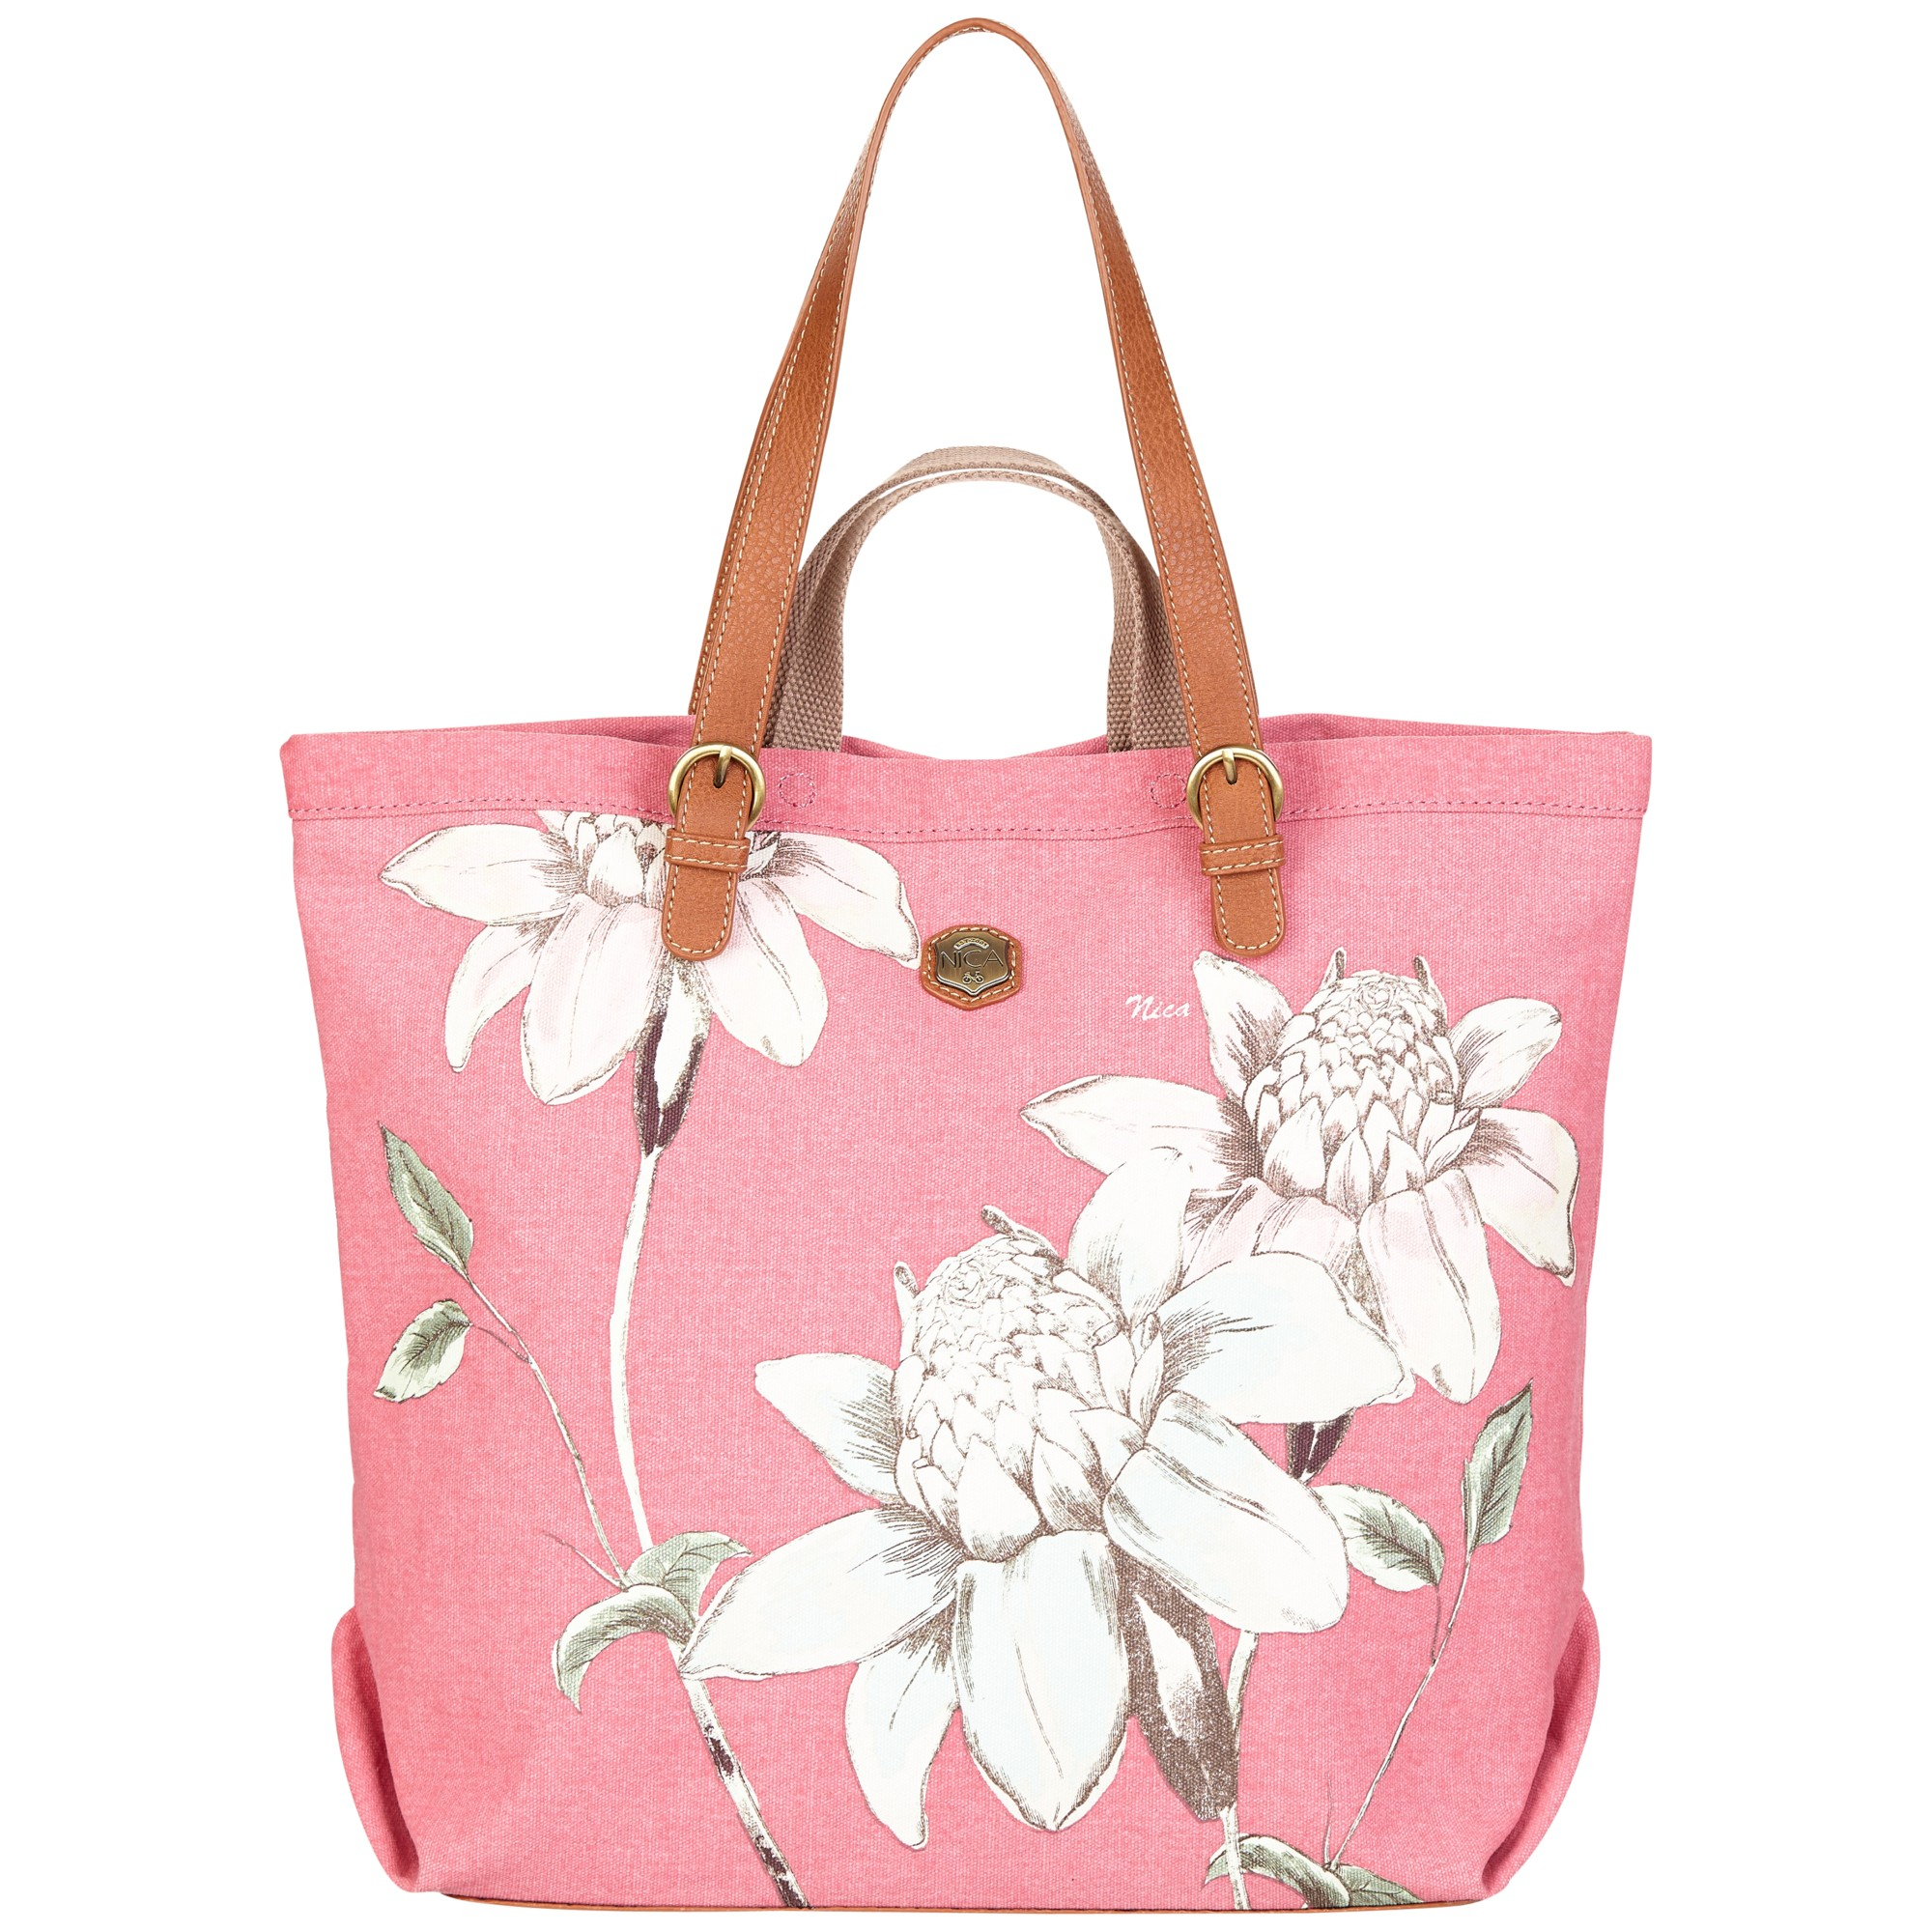 Nica Sheila Tote Bag in Rose (Pink)